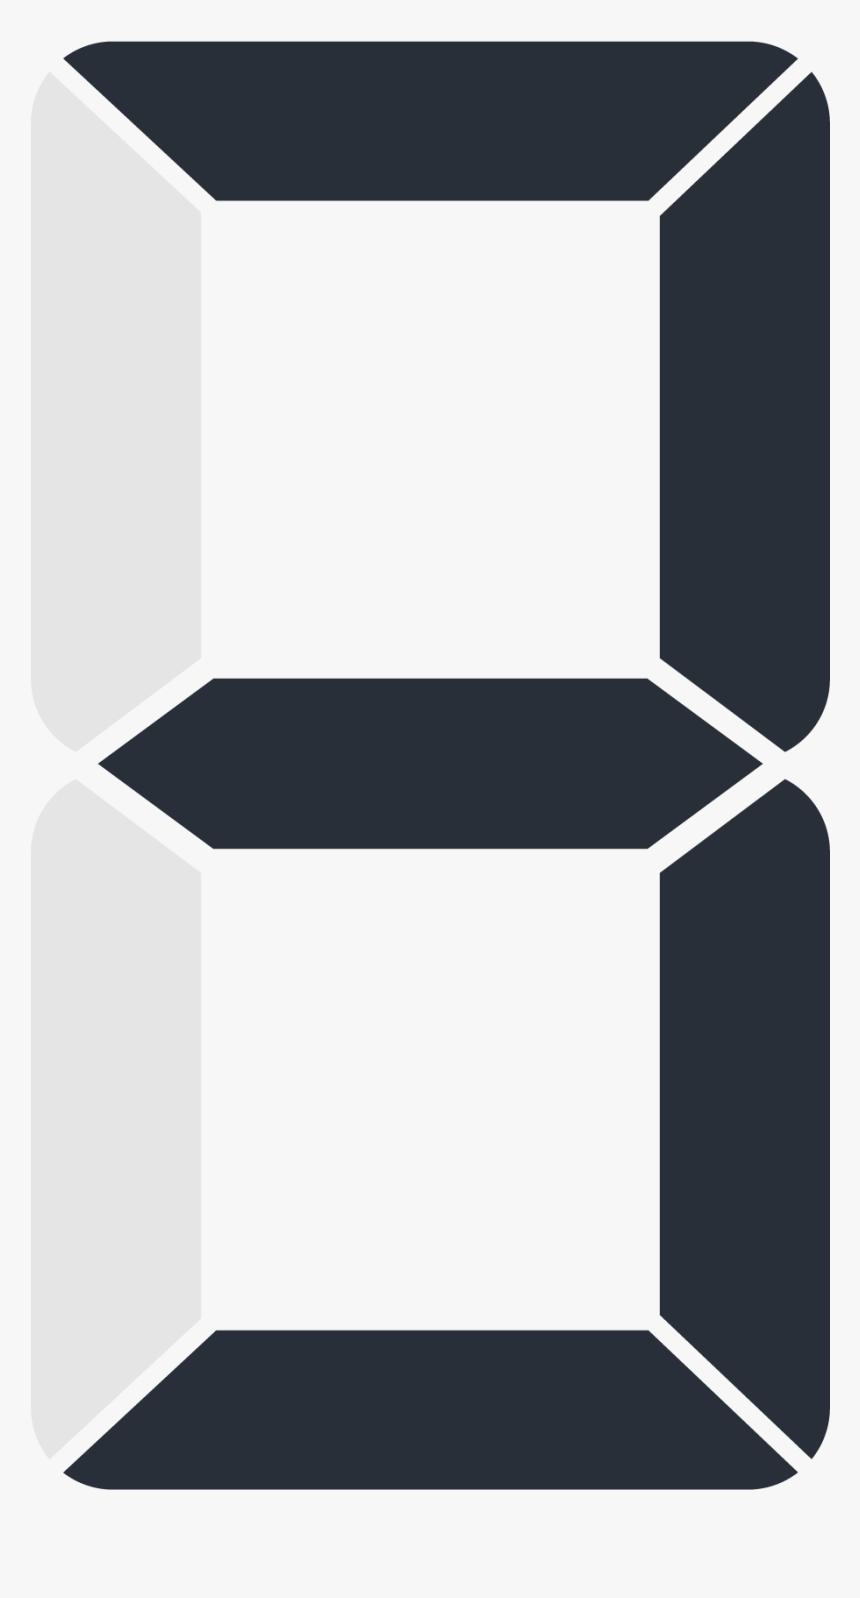 3 Number Png Royalty-free Image - Number Transparent Background, Png Download, Free Download